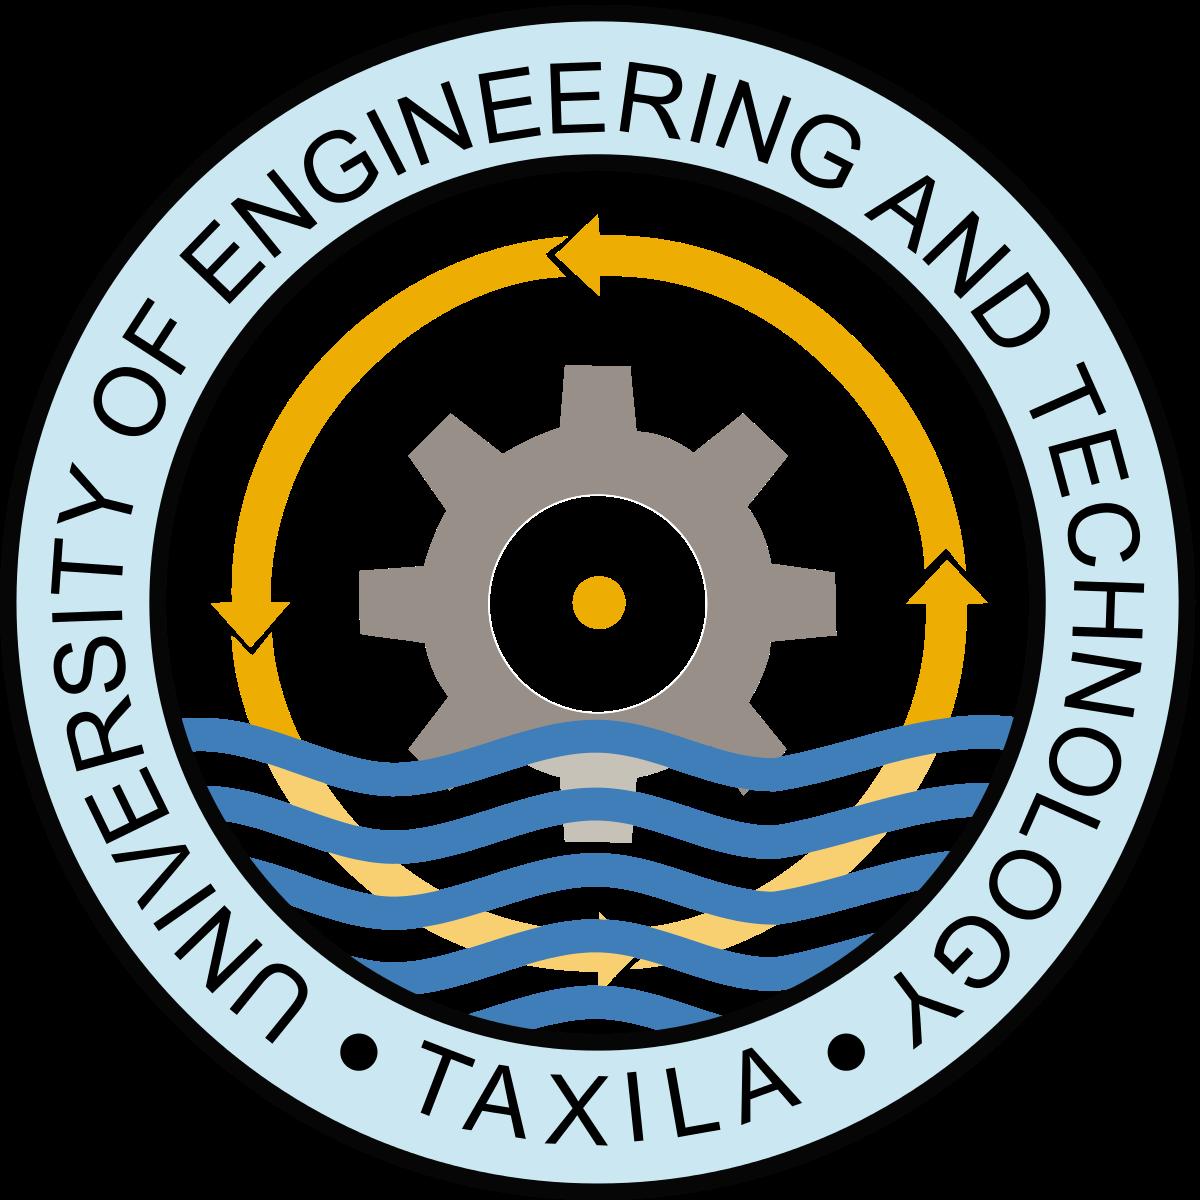 UET Taxila BSc Computer Engg Sem-VIII Result Spring 2021